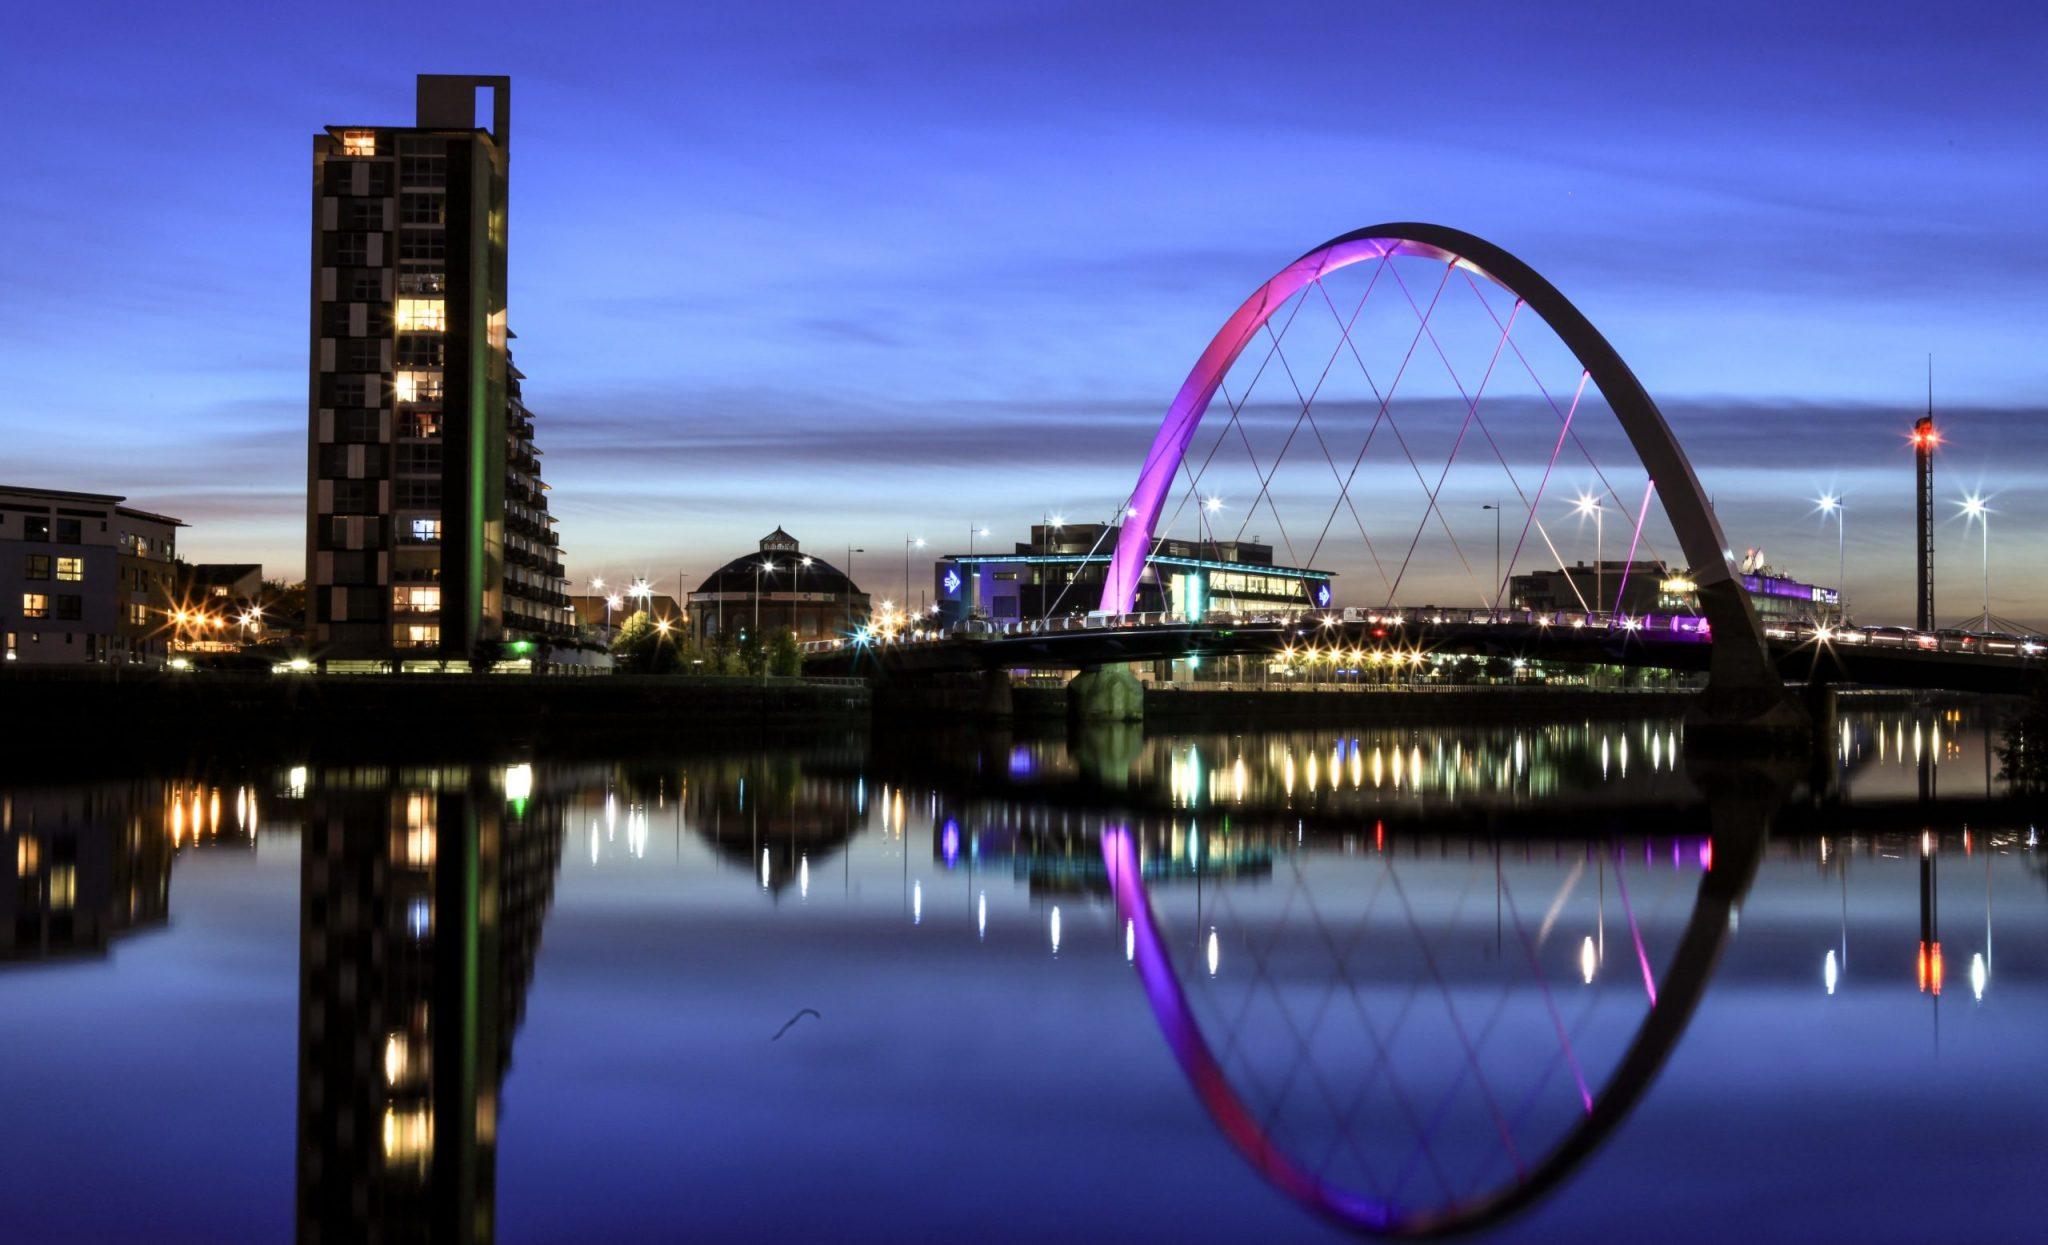 Glasgow arc bridge lit up purple at night time